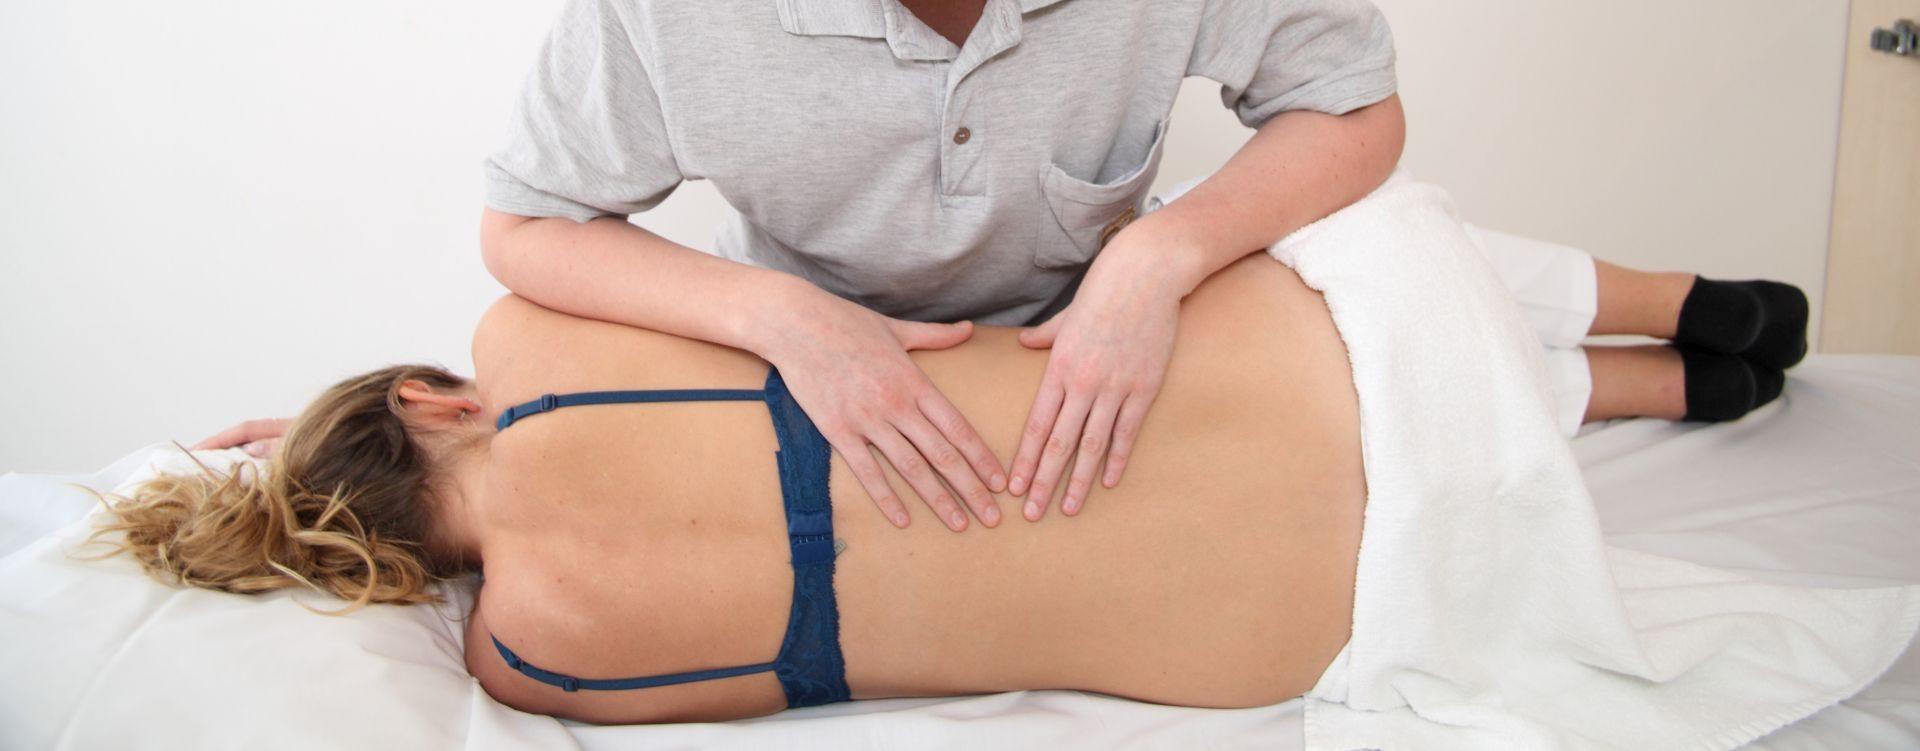 Sports Medicine and Trauma Surgery